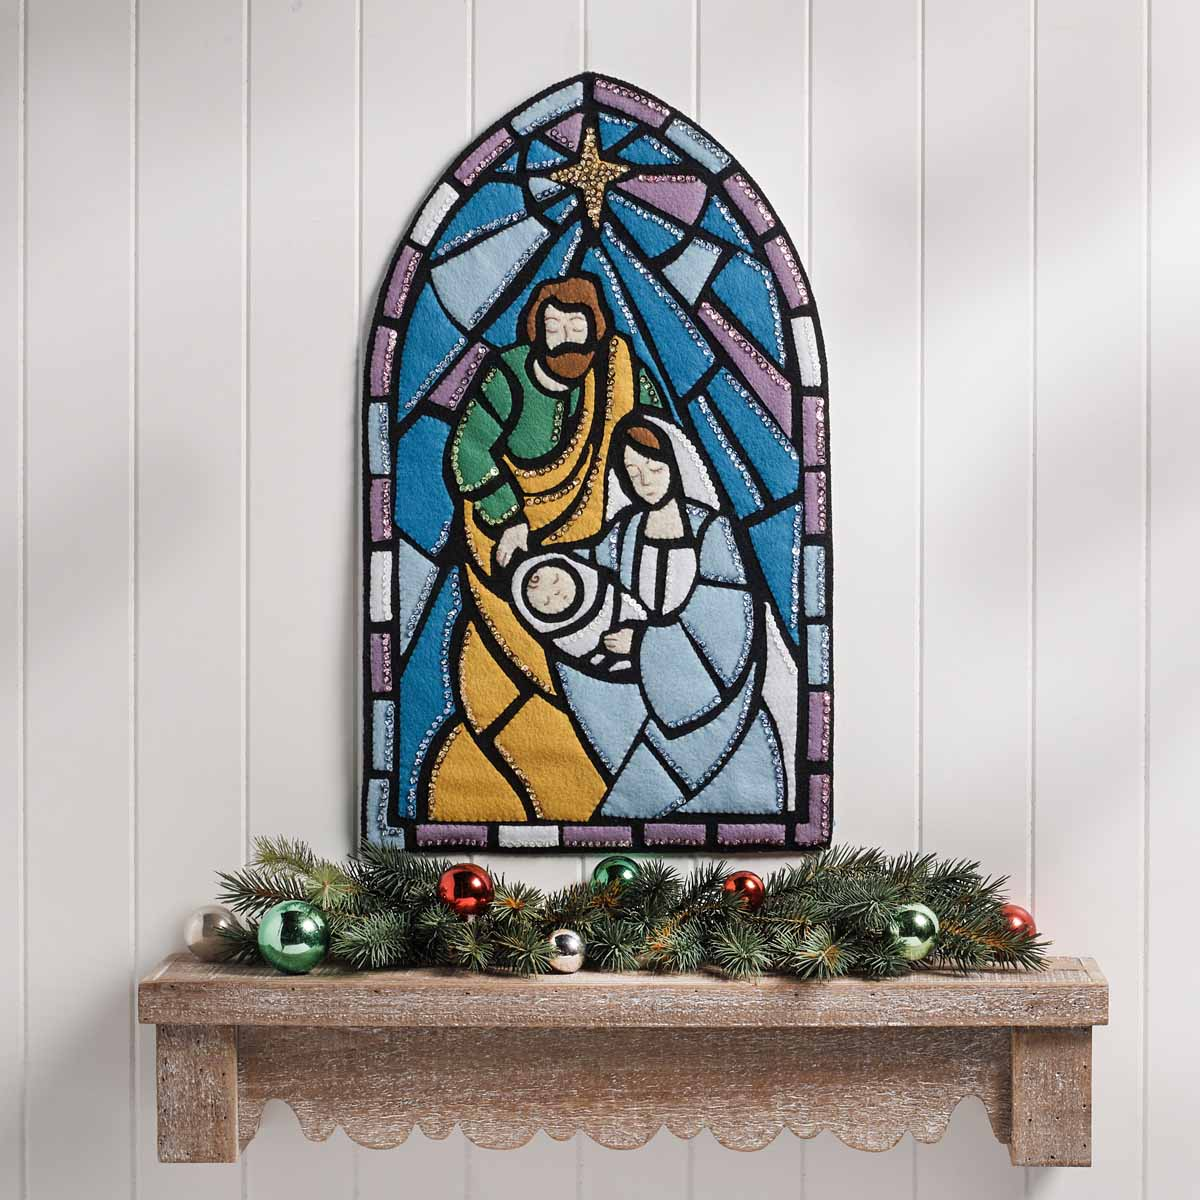 Bucilla ® Seasonal - Felt - Home Decor - Stained Glass Nativity Wall Hanging - 89271E